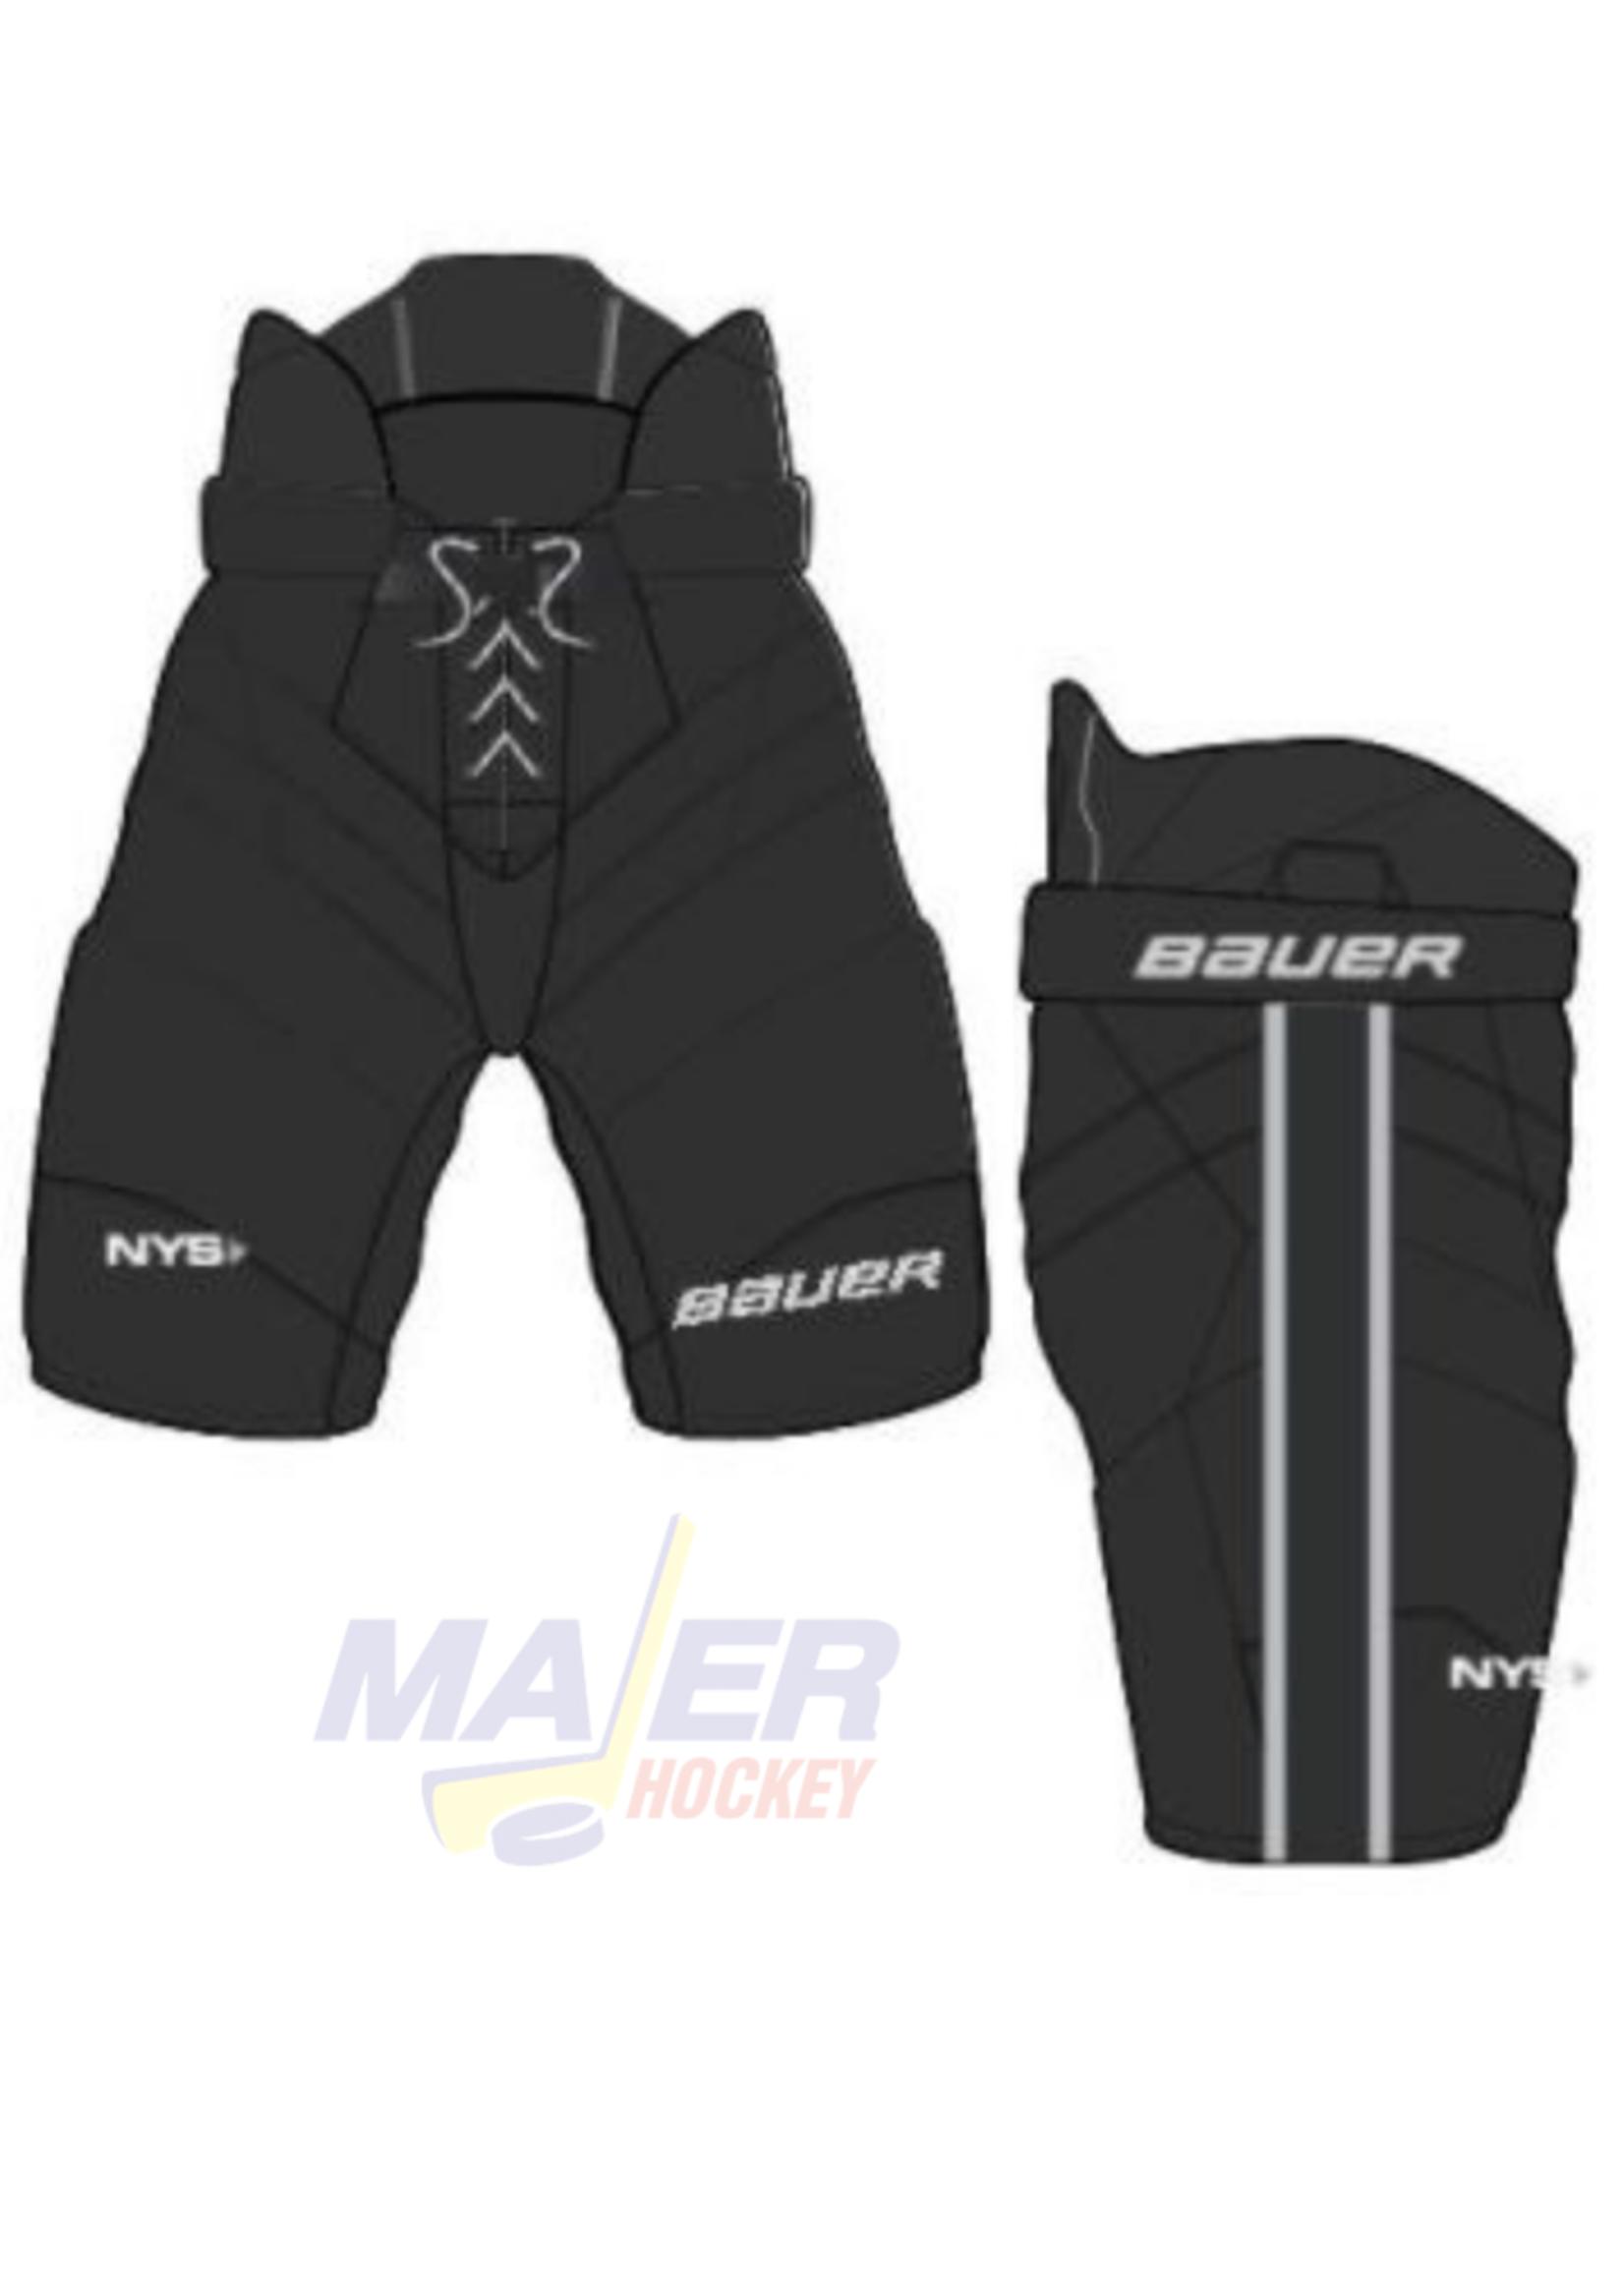 Bauer NYS Women's Hockey Pants